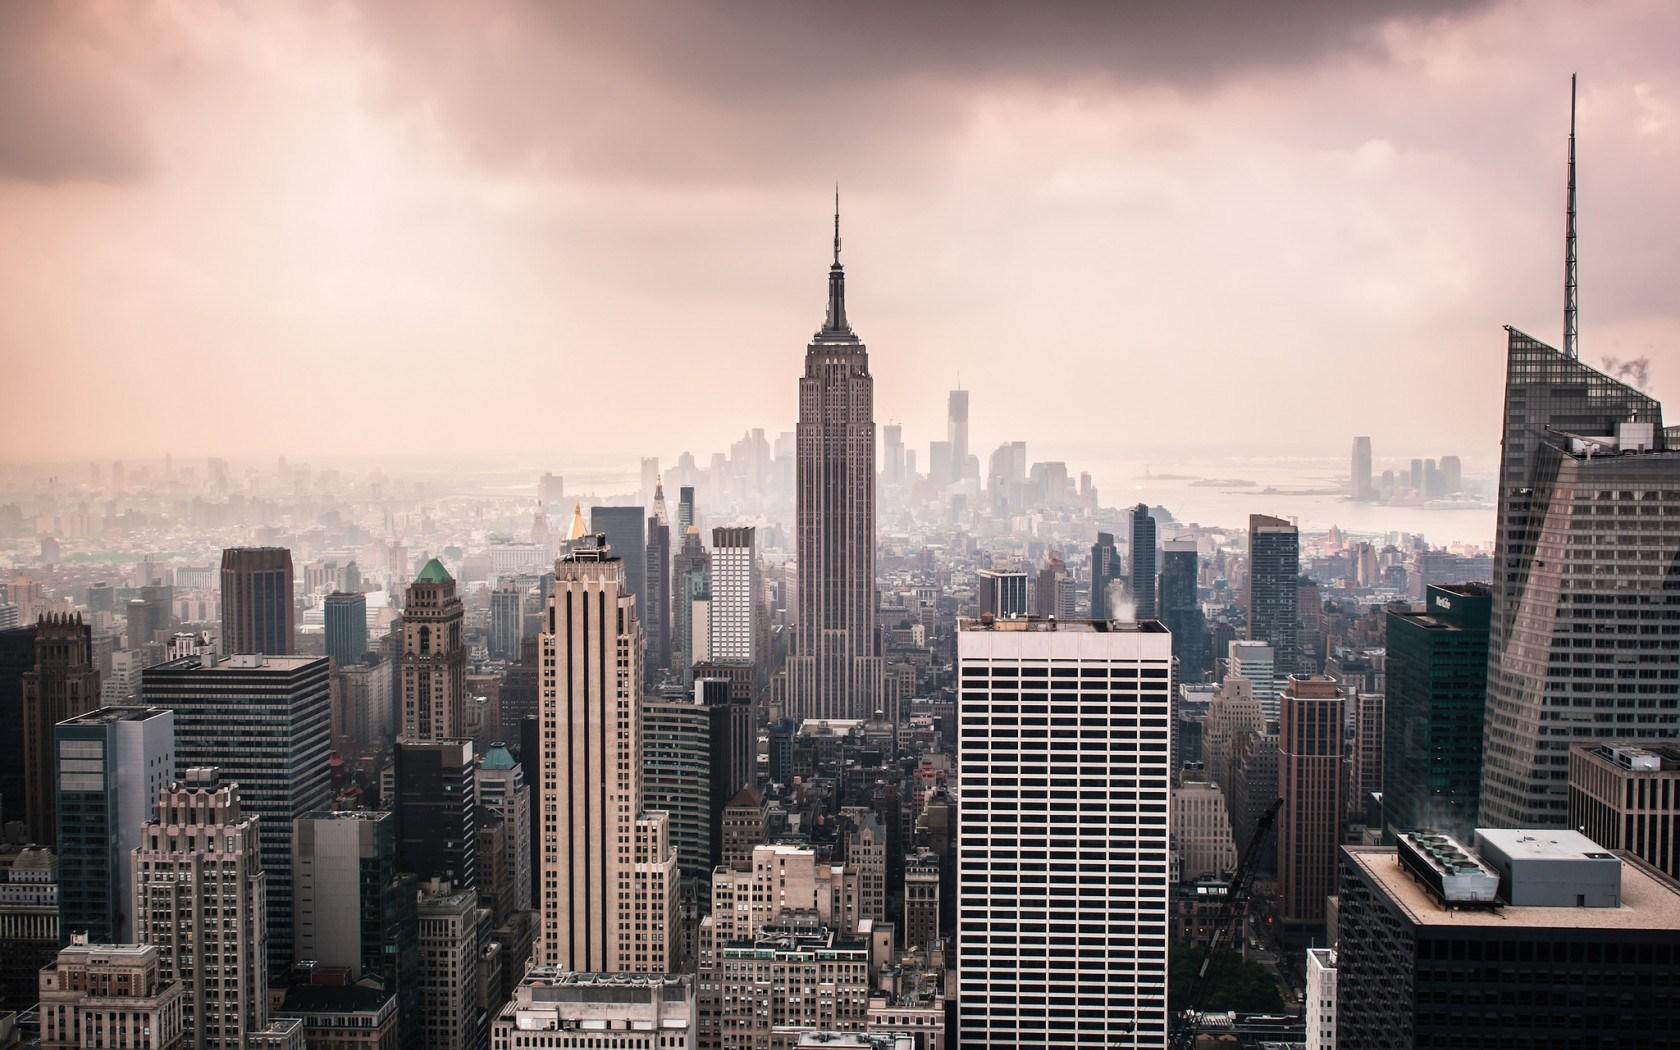 new york USA city towers photo skyline vintage hd wallpaper 1680x1050